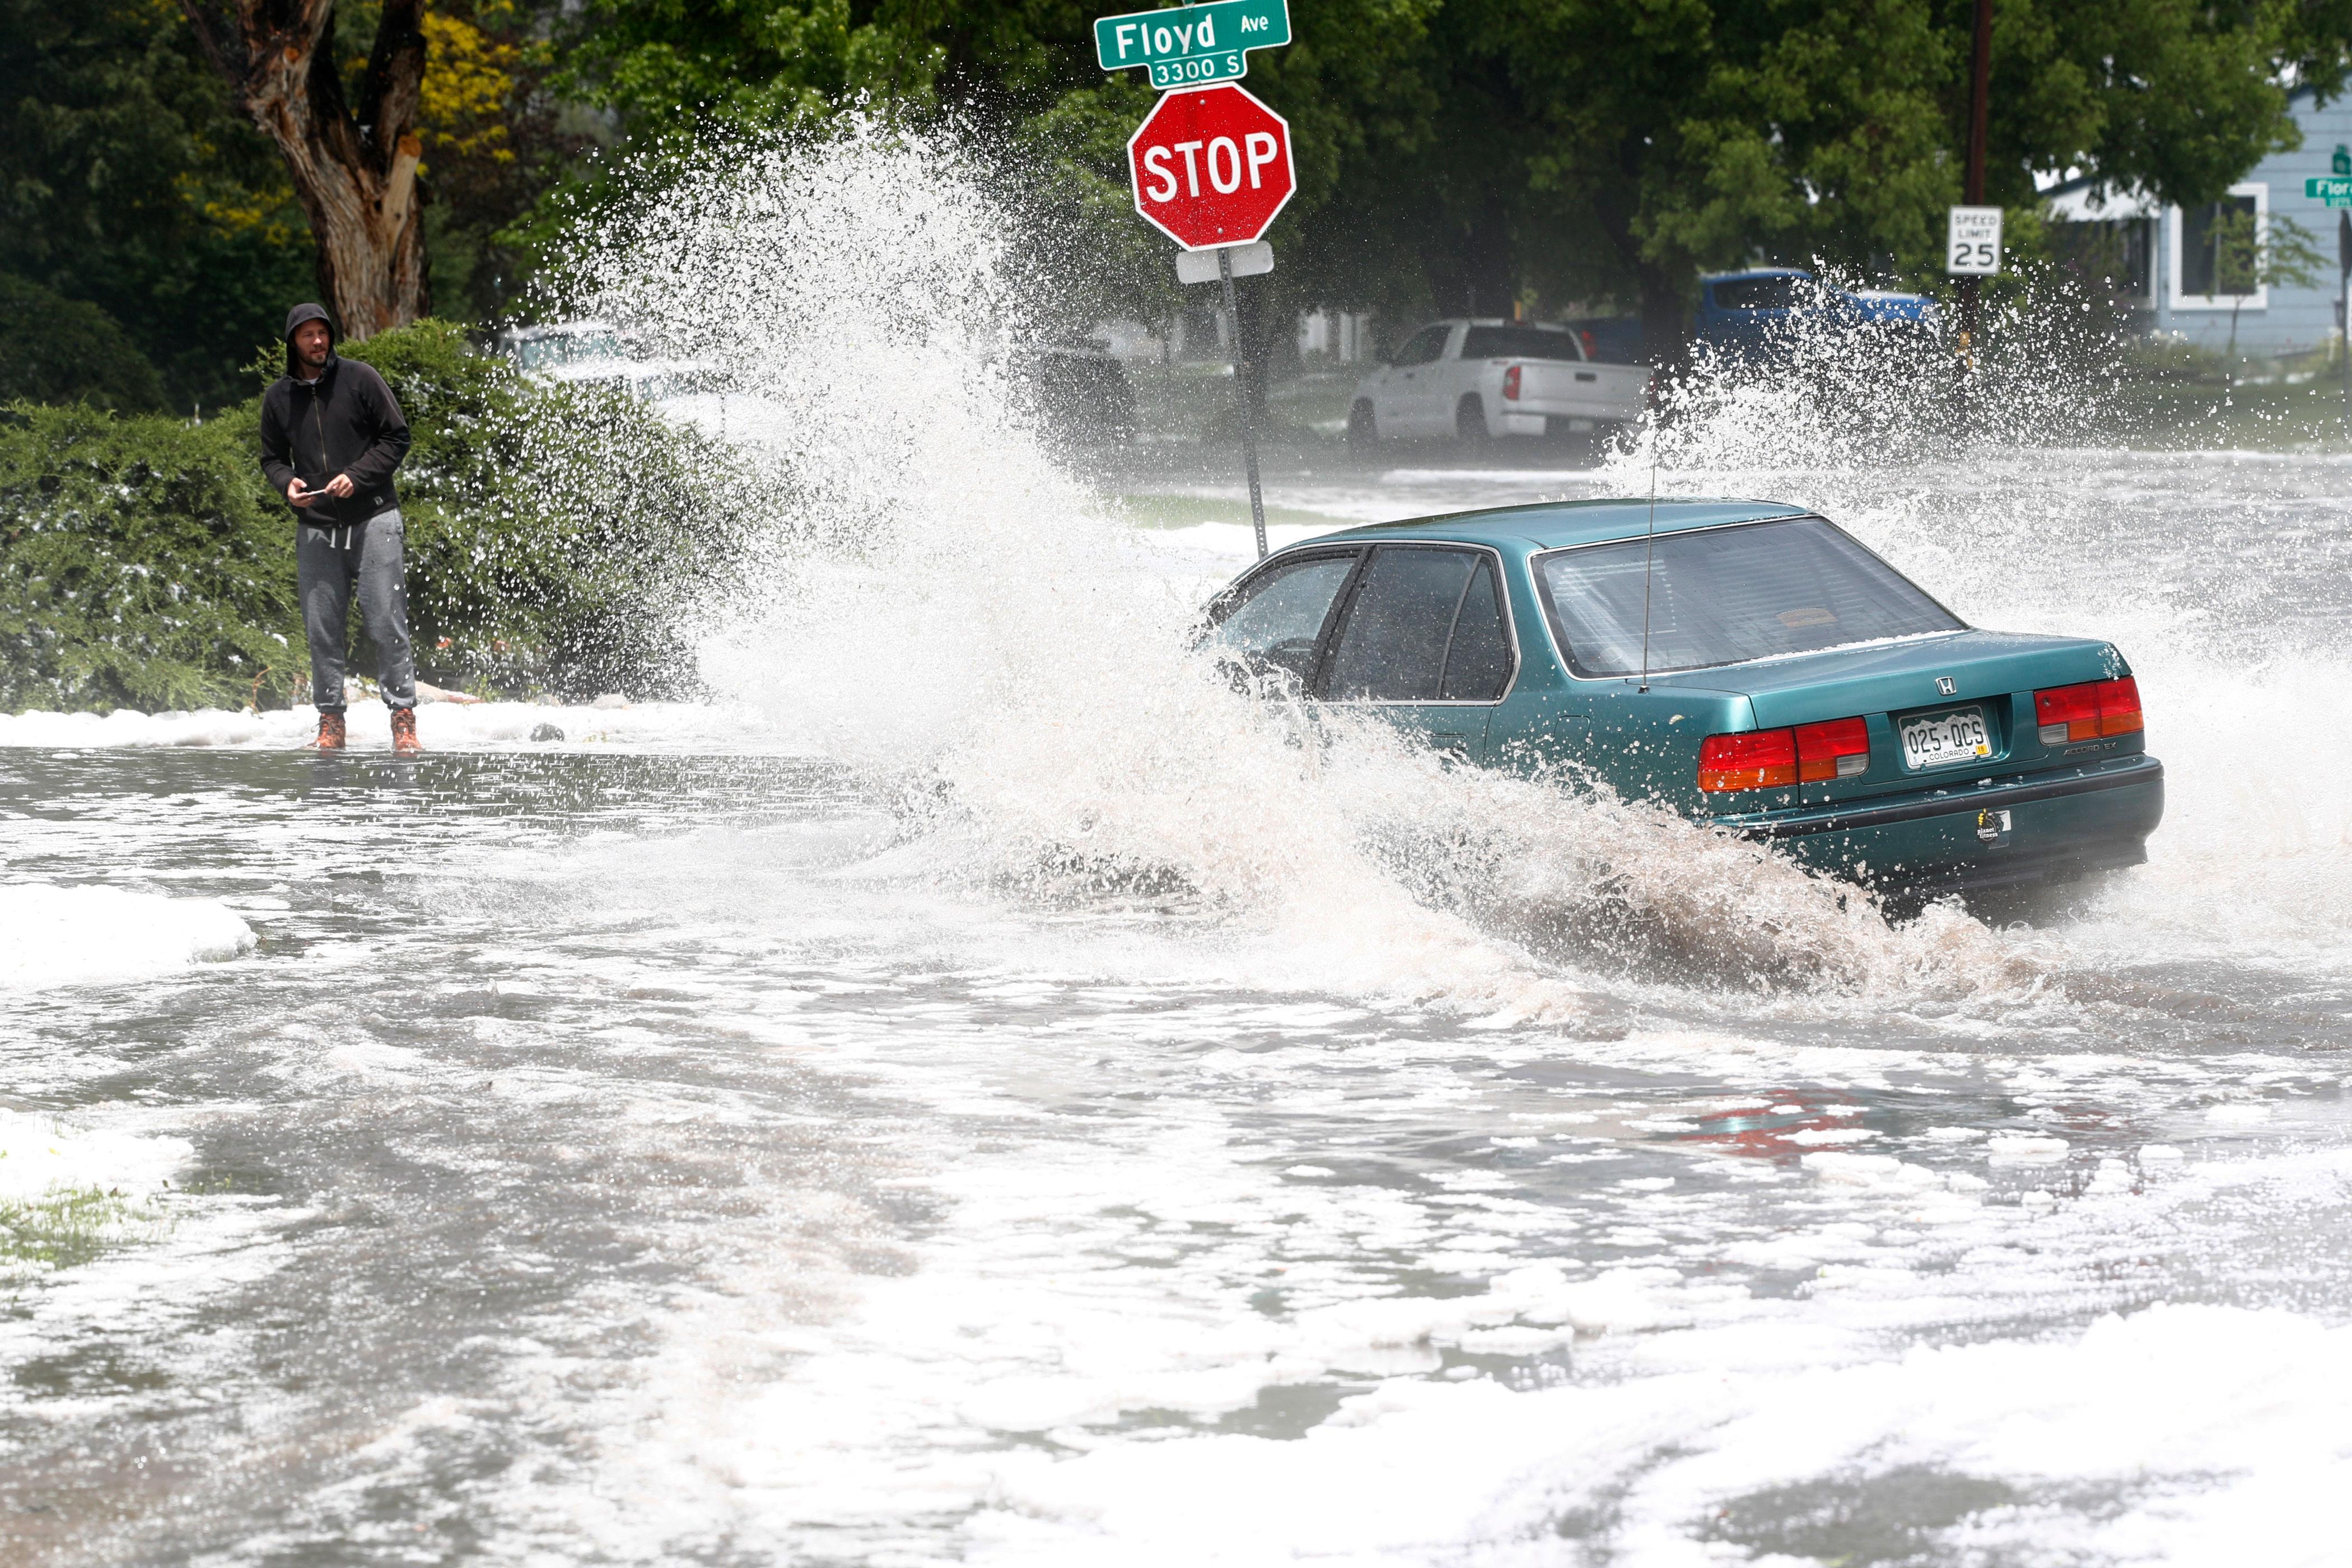 Photo: Denver Hailstorm | Car In Hail Flooded Street - AP